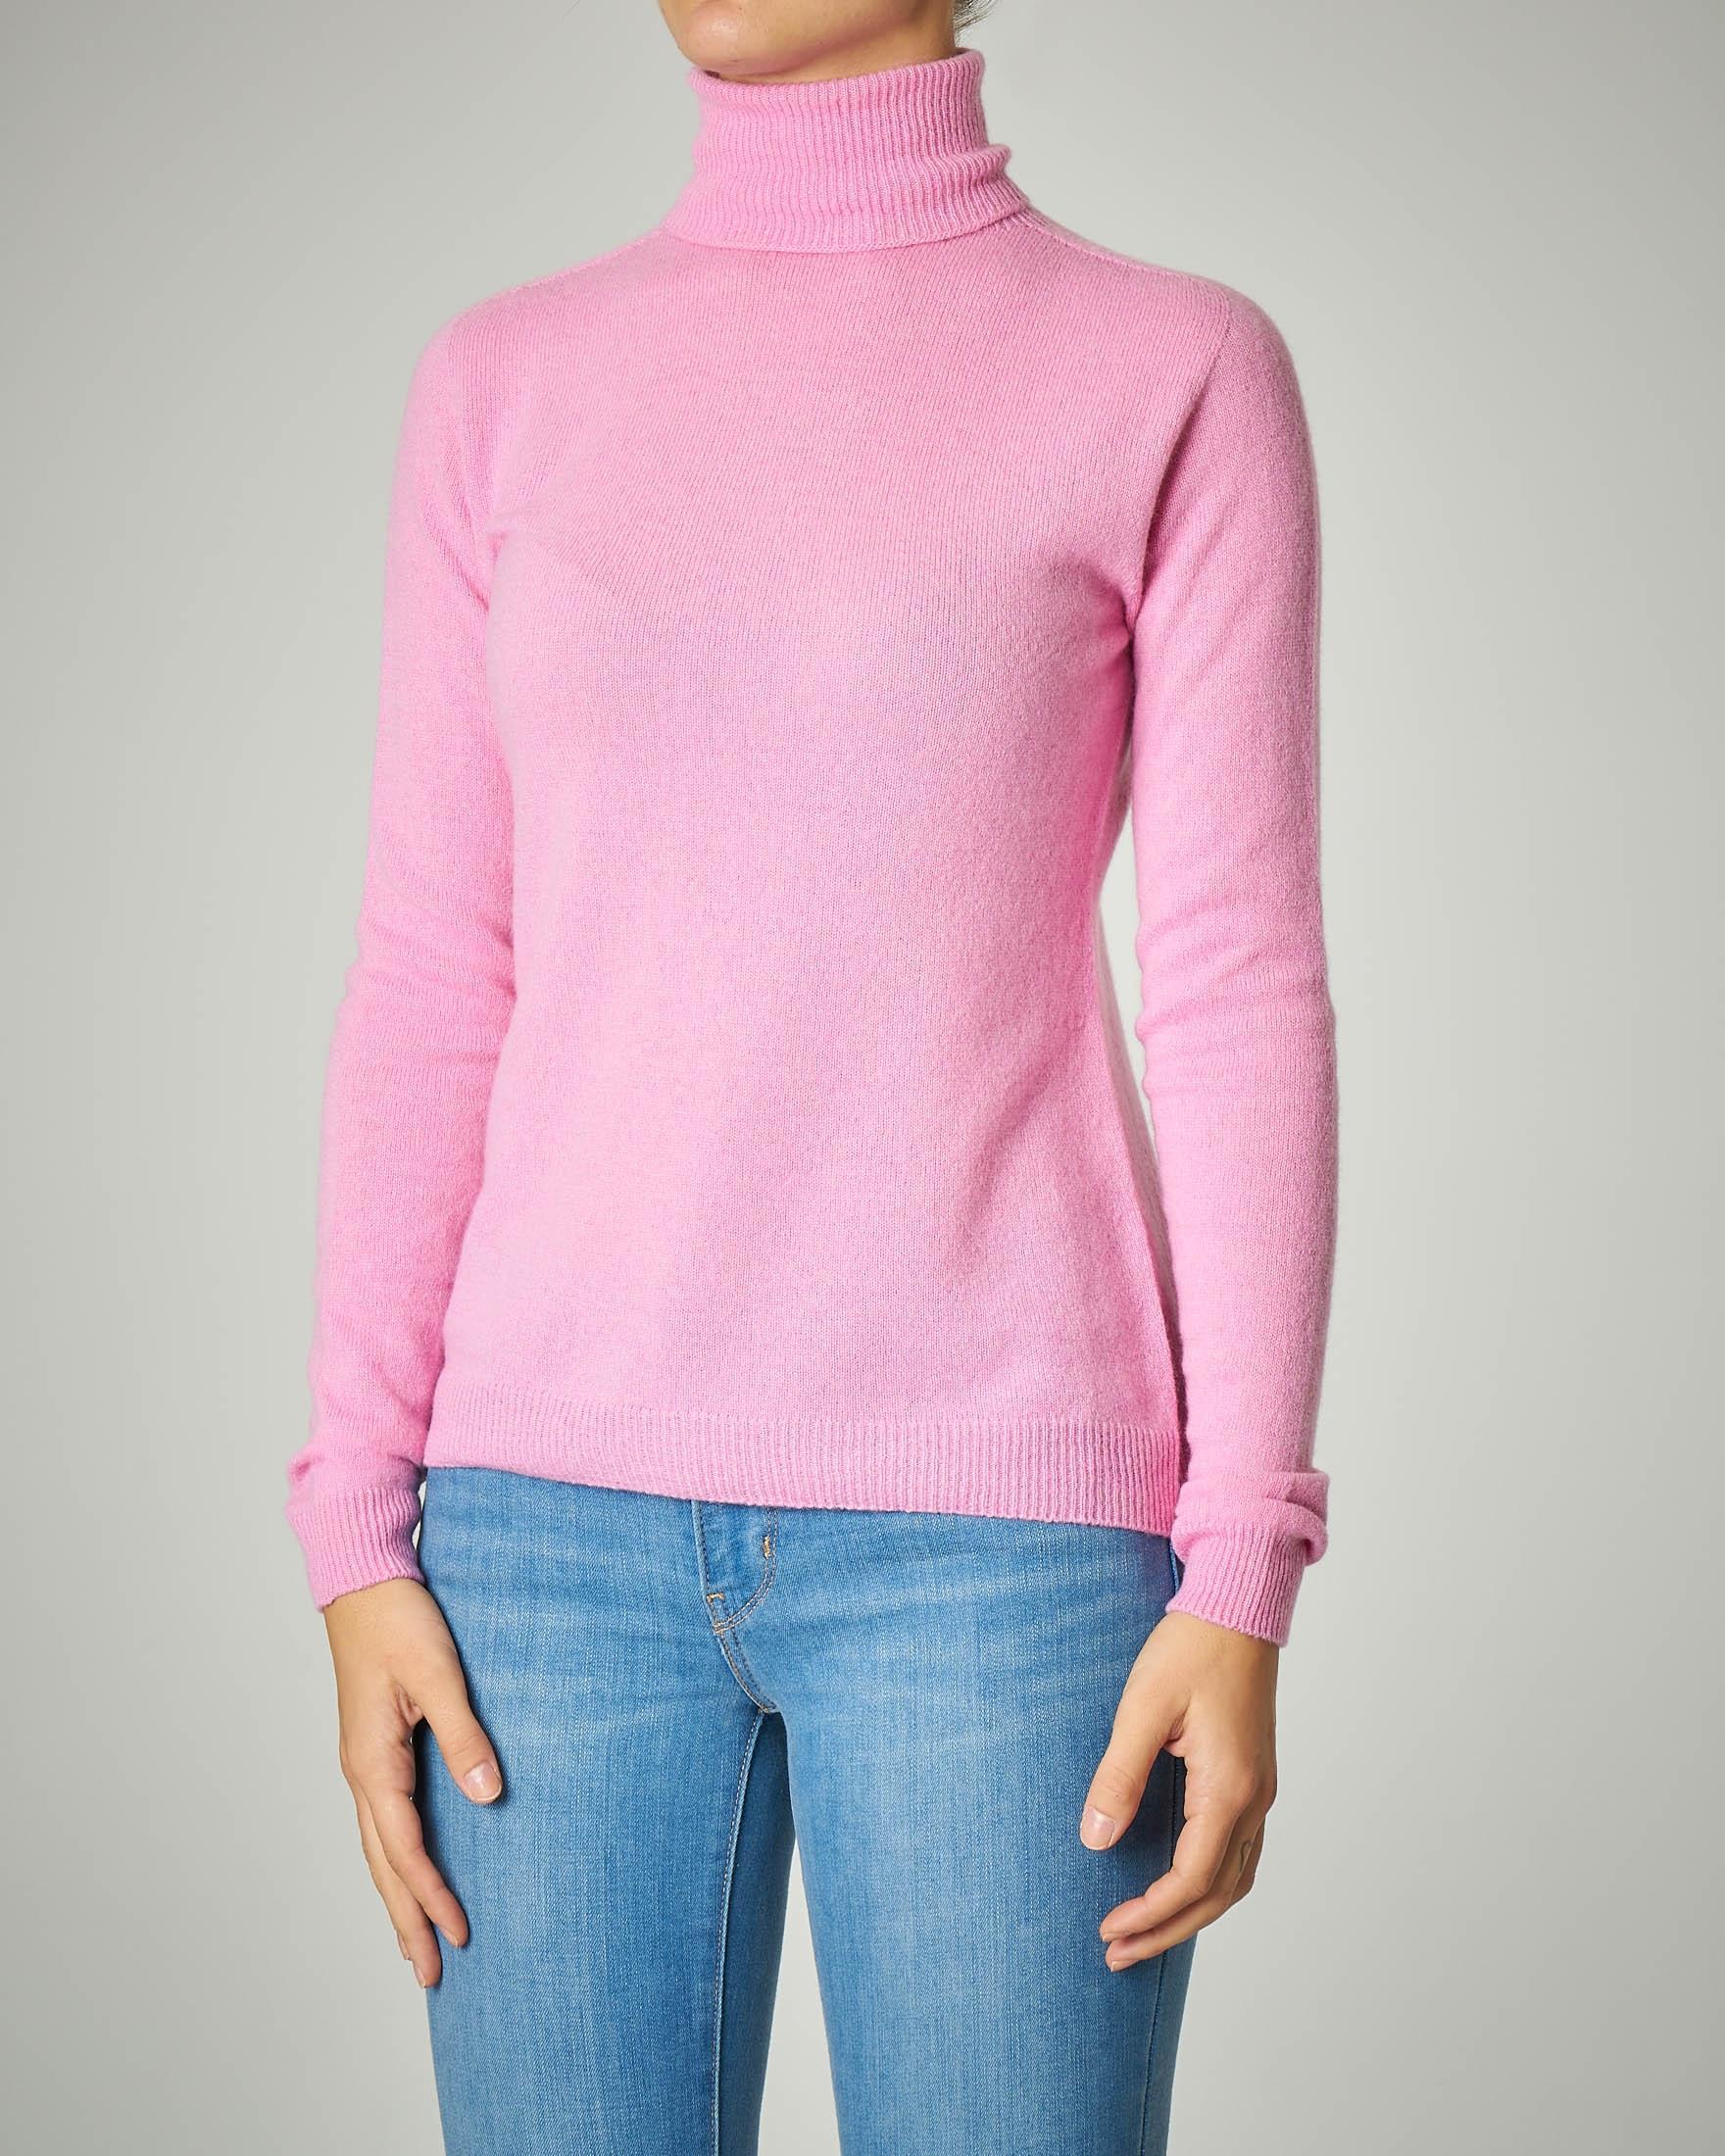 Dolcevita rosa in lana misto cashmere